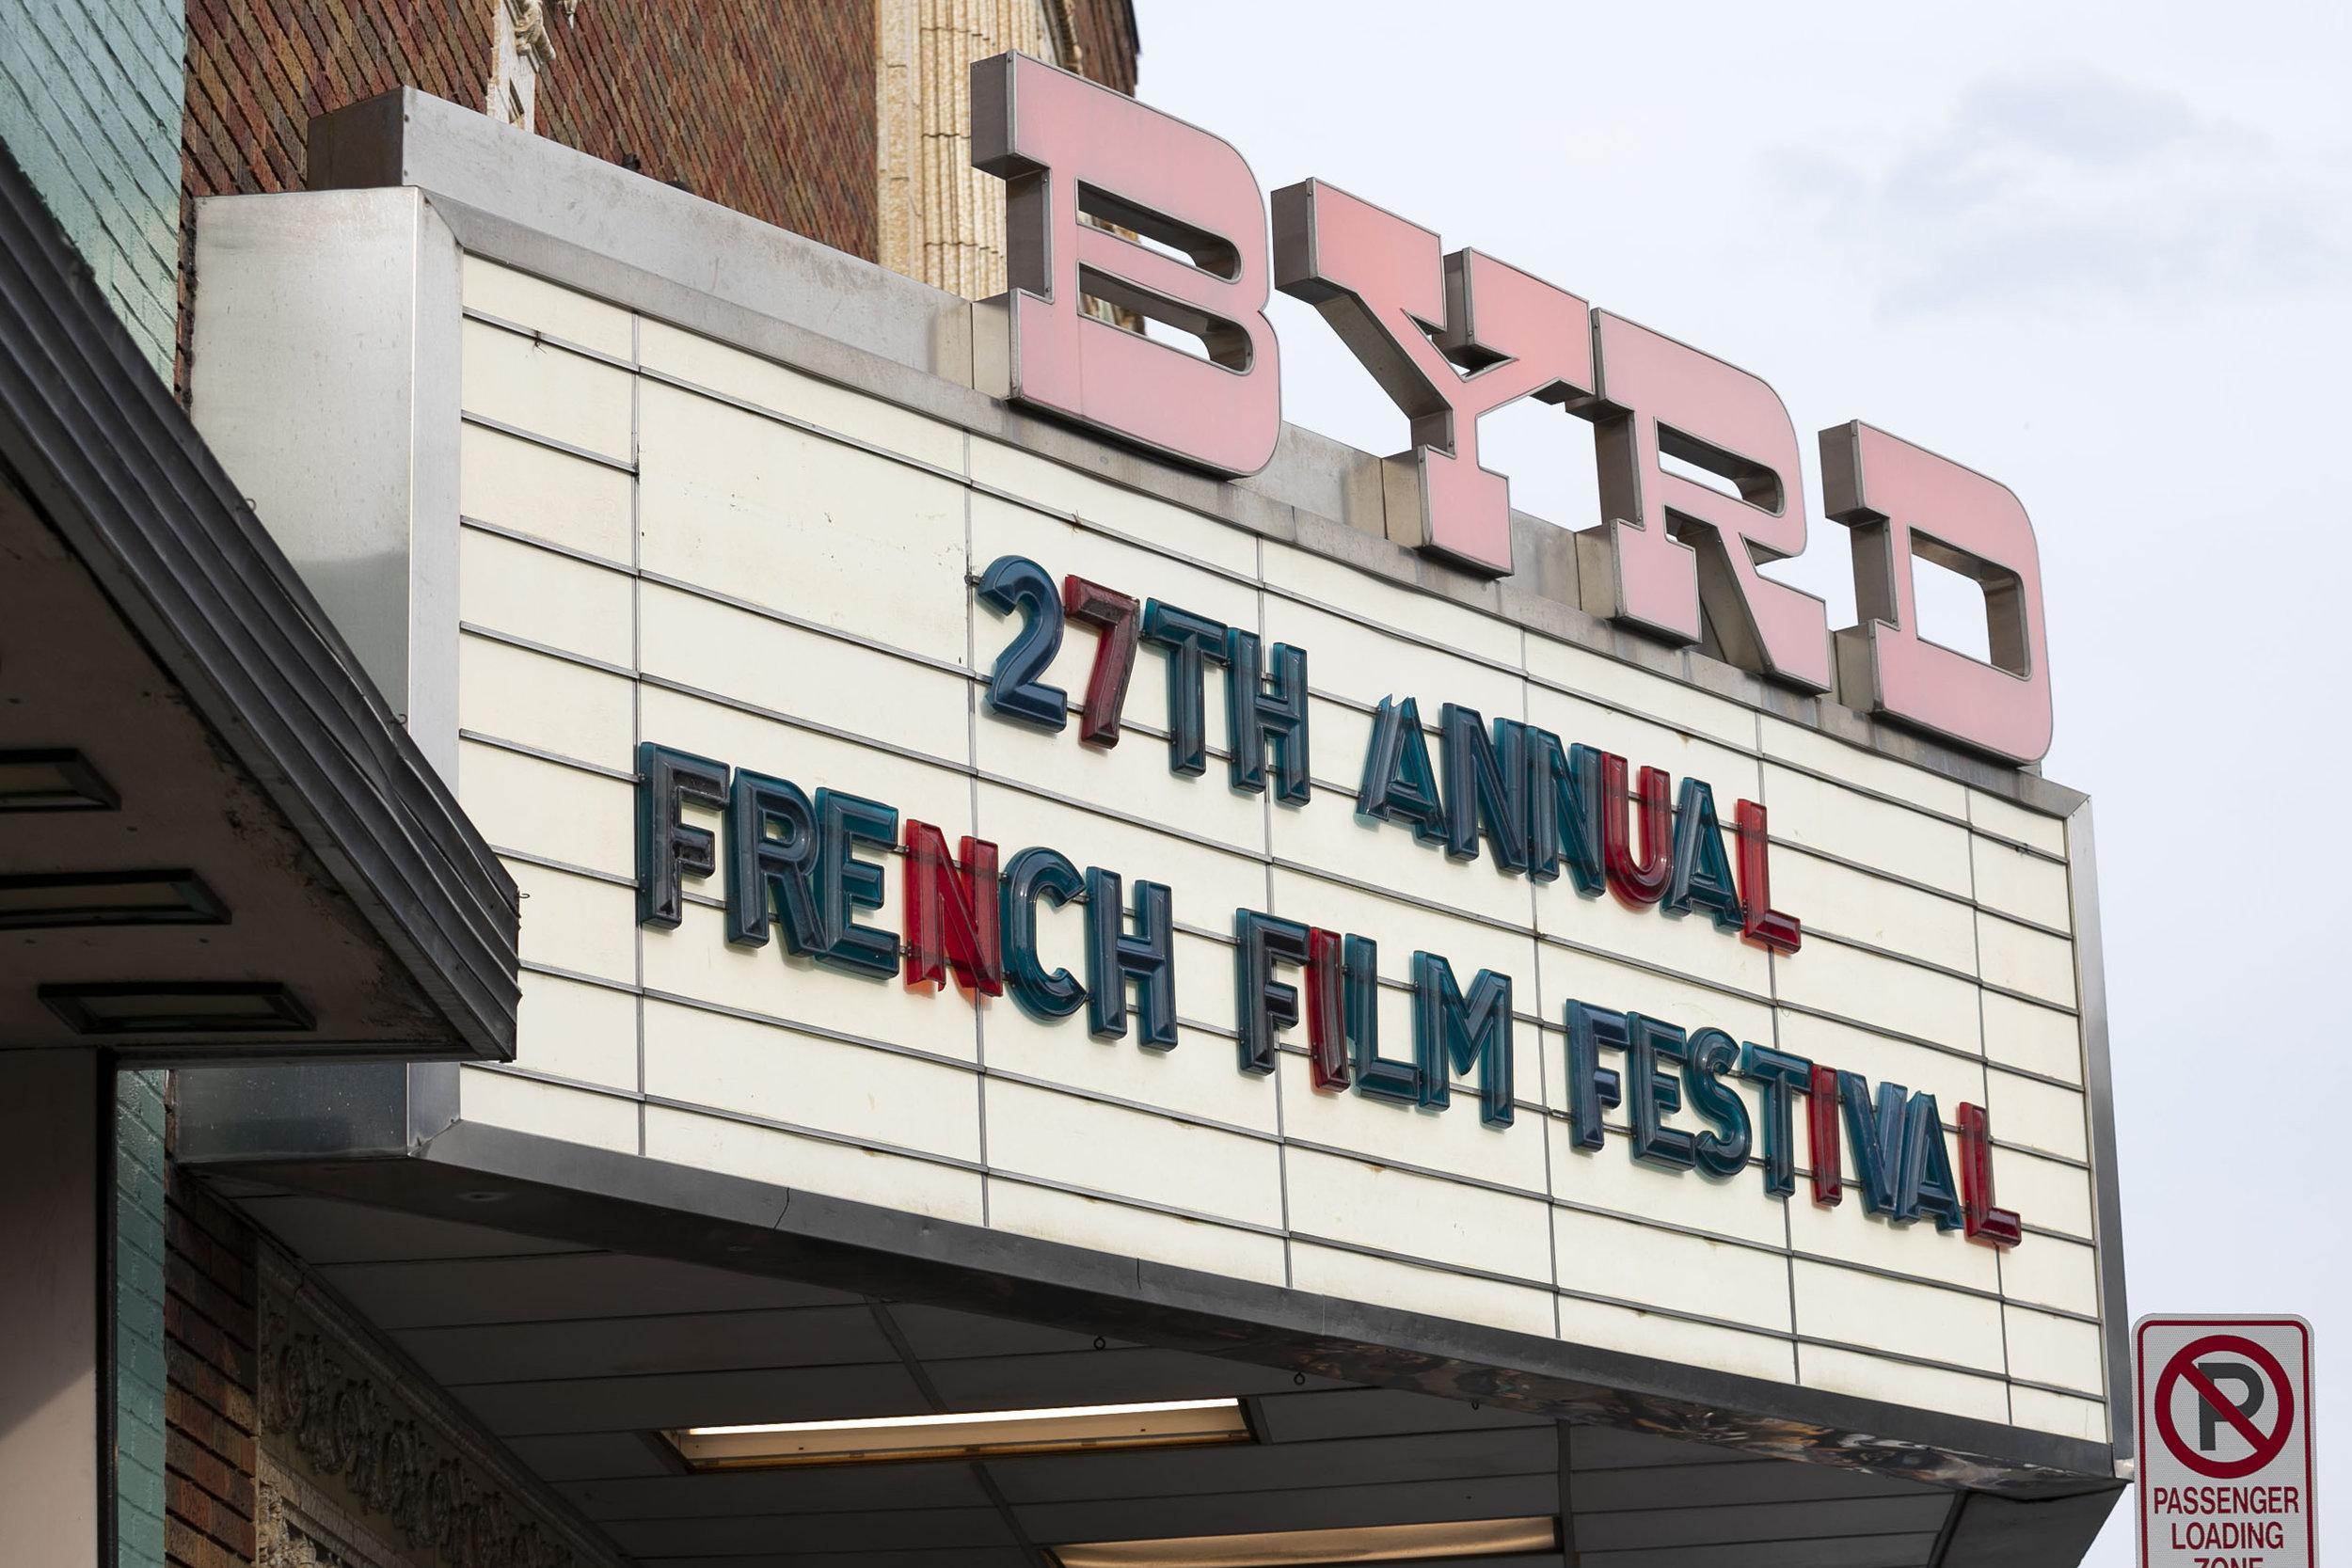 FRENCH FILM FESTIVAL 3.30_Gessler Santos-Lopez61.JPG